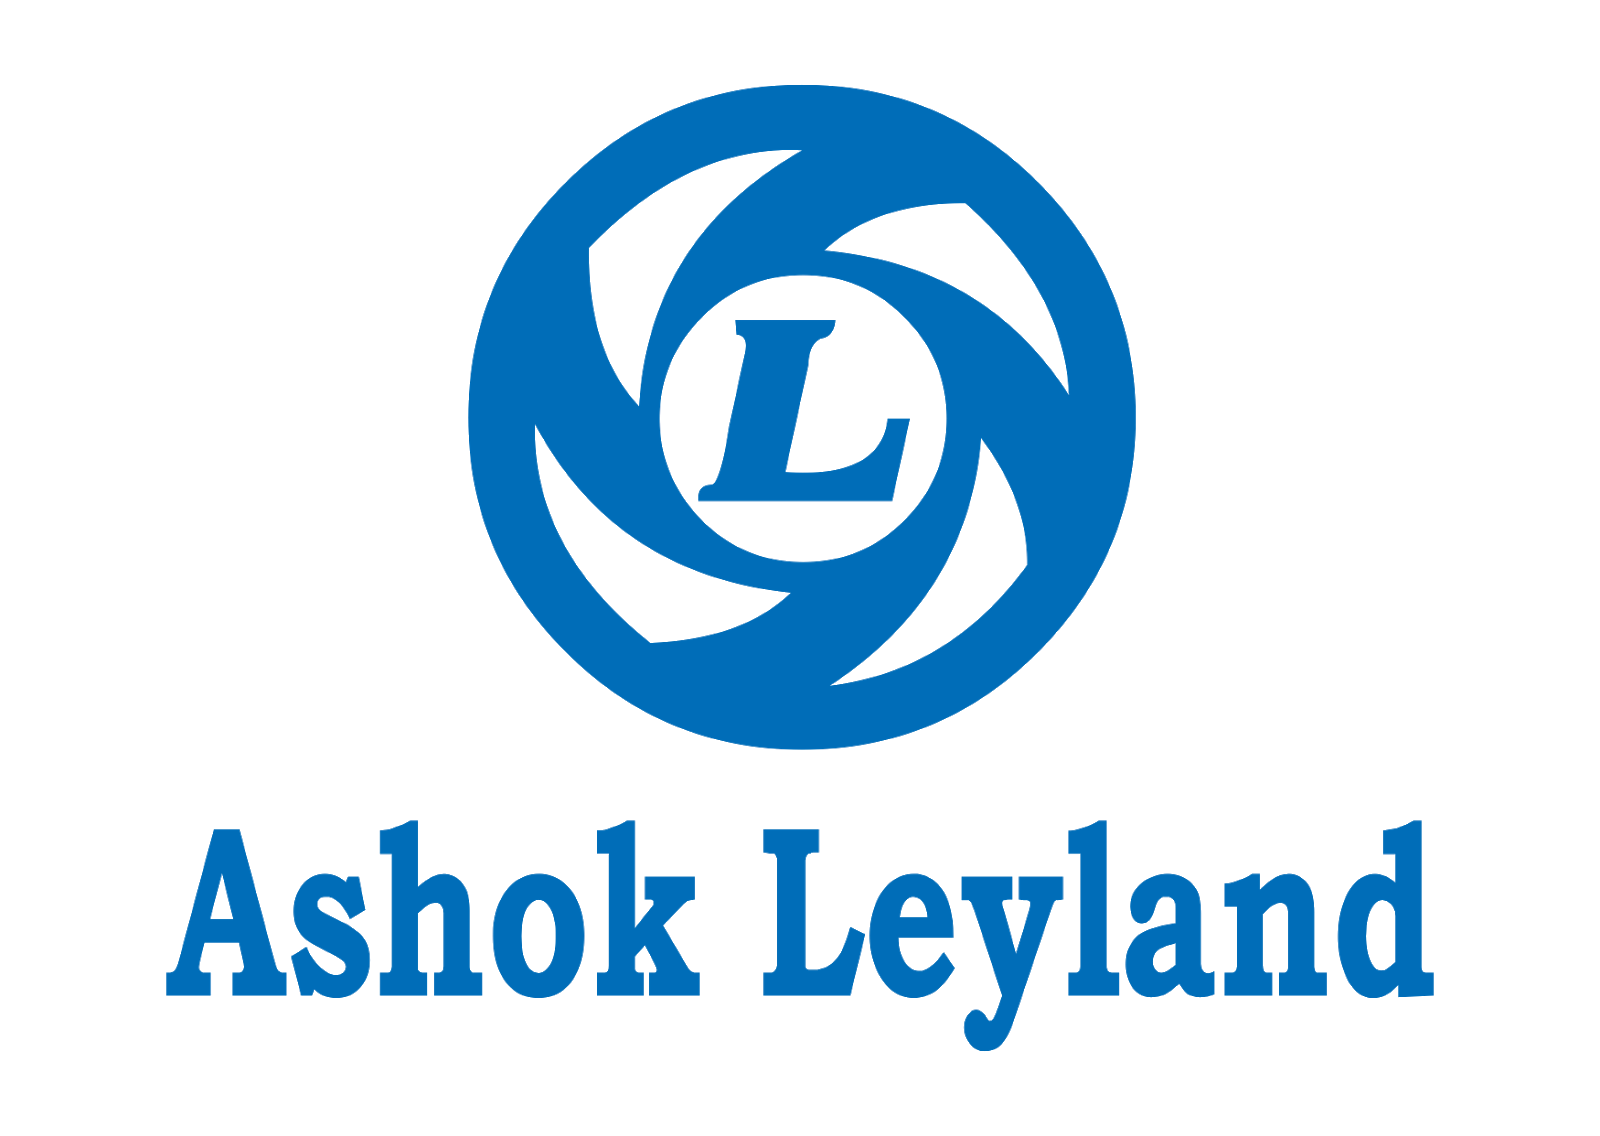 Ashok Leyland vector logo